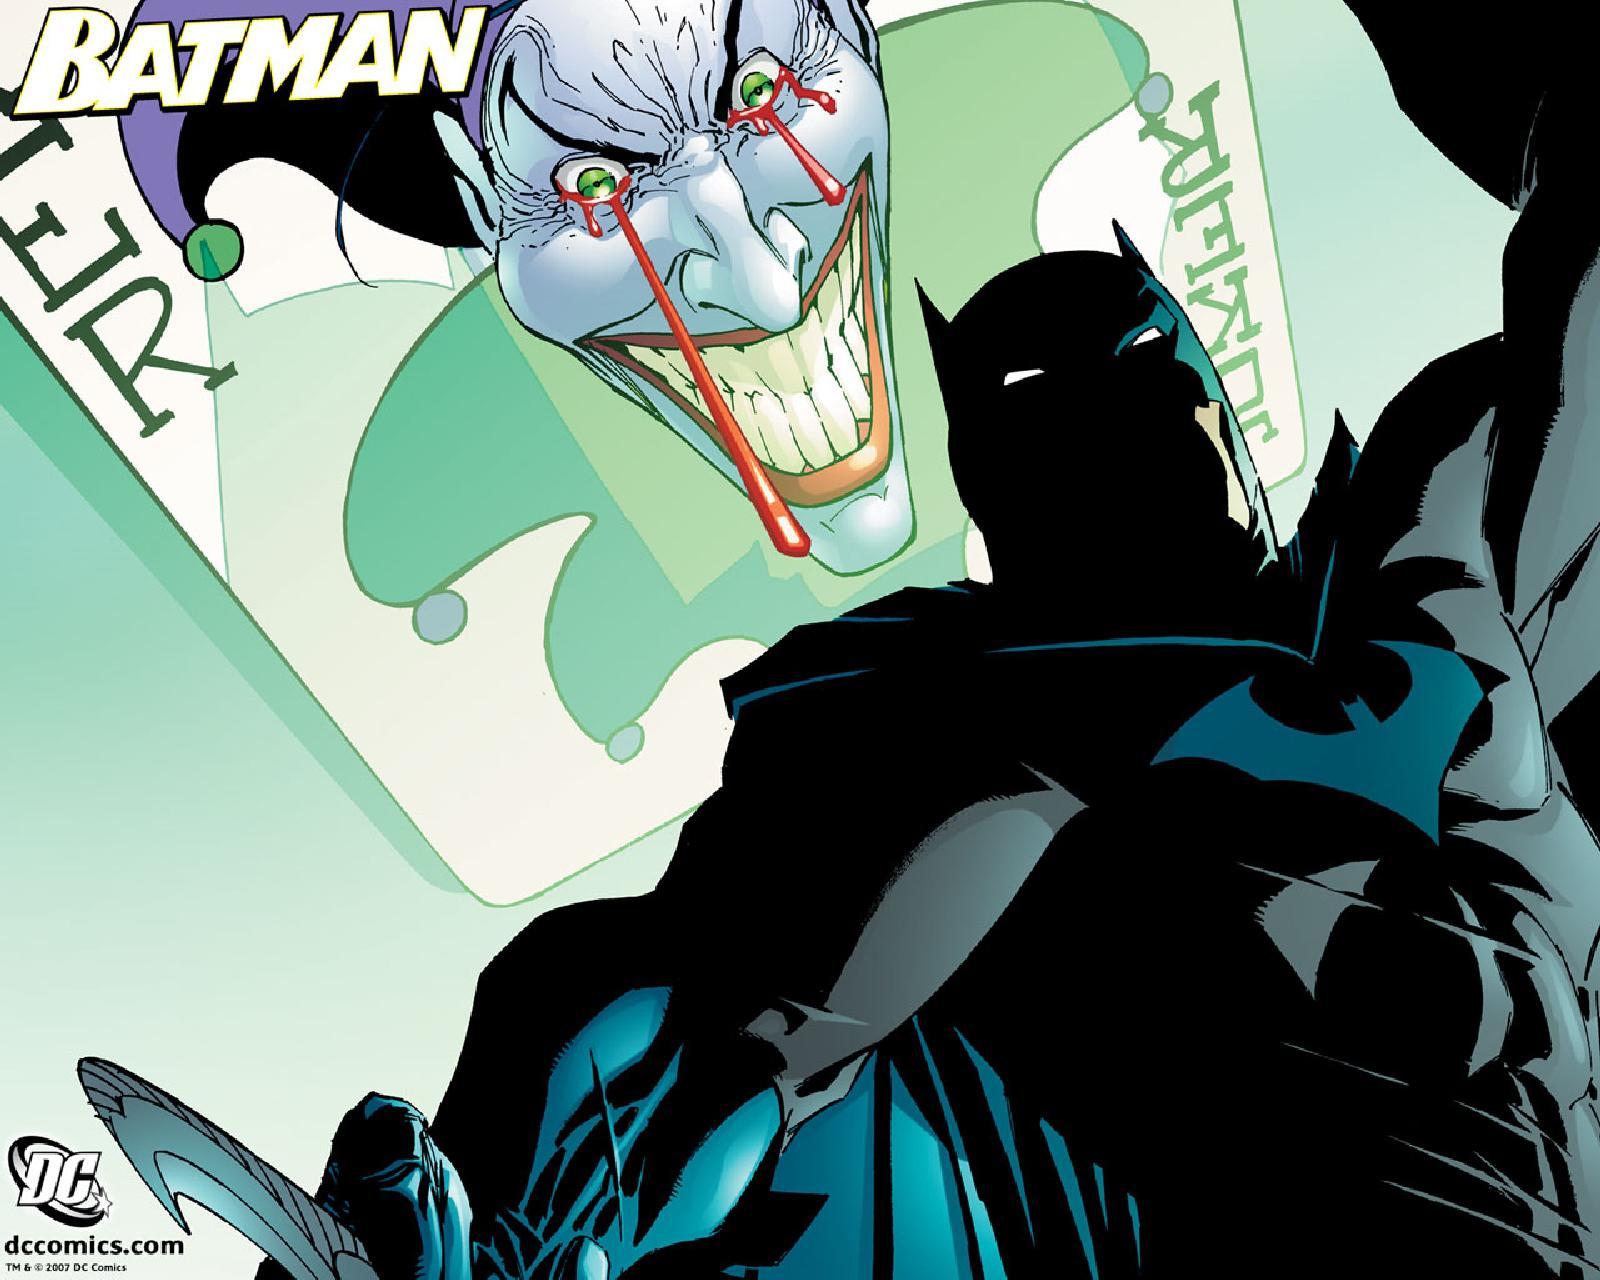 Batman vs Joker Wallpaper 1600x1280